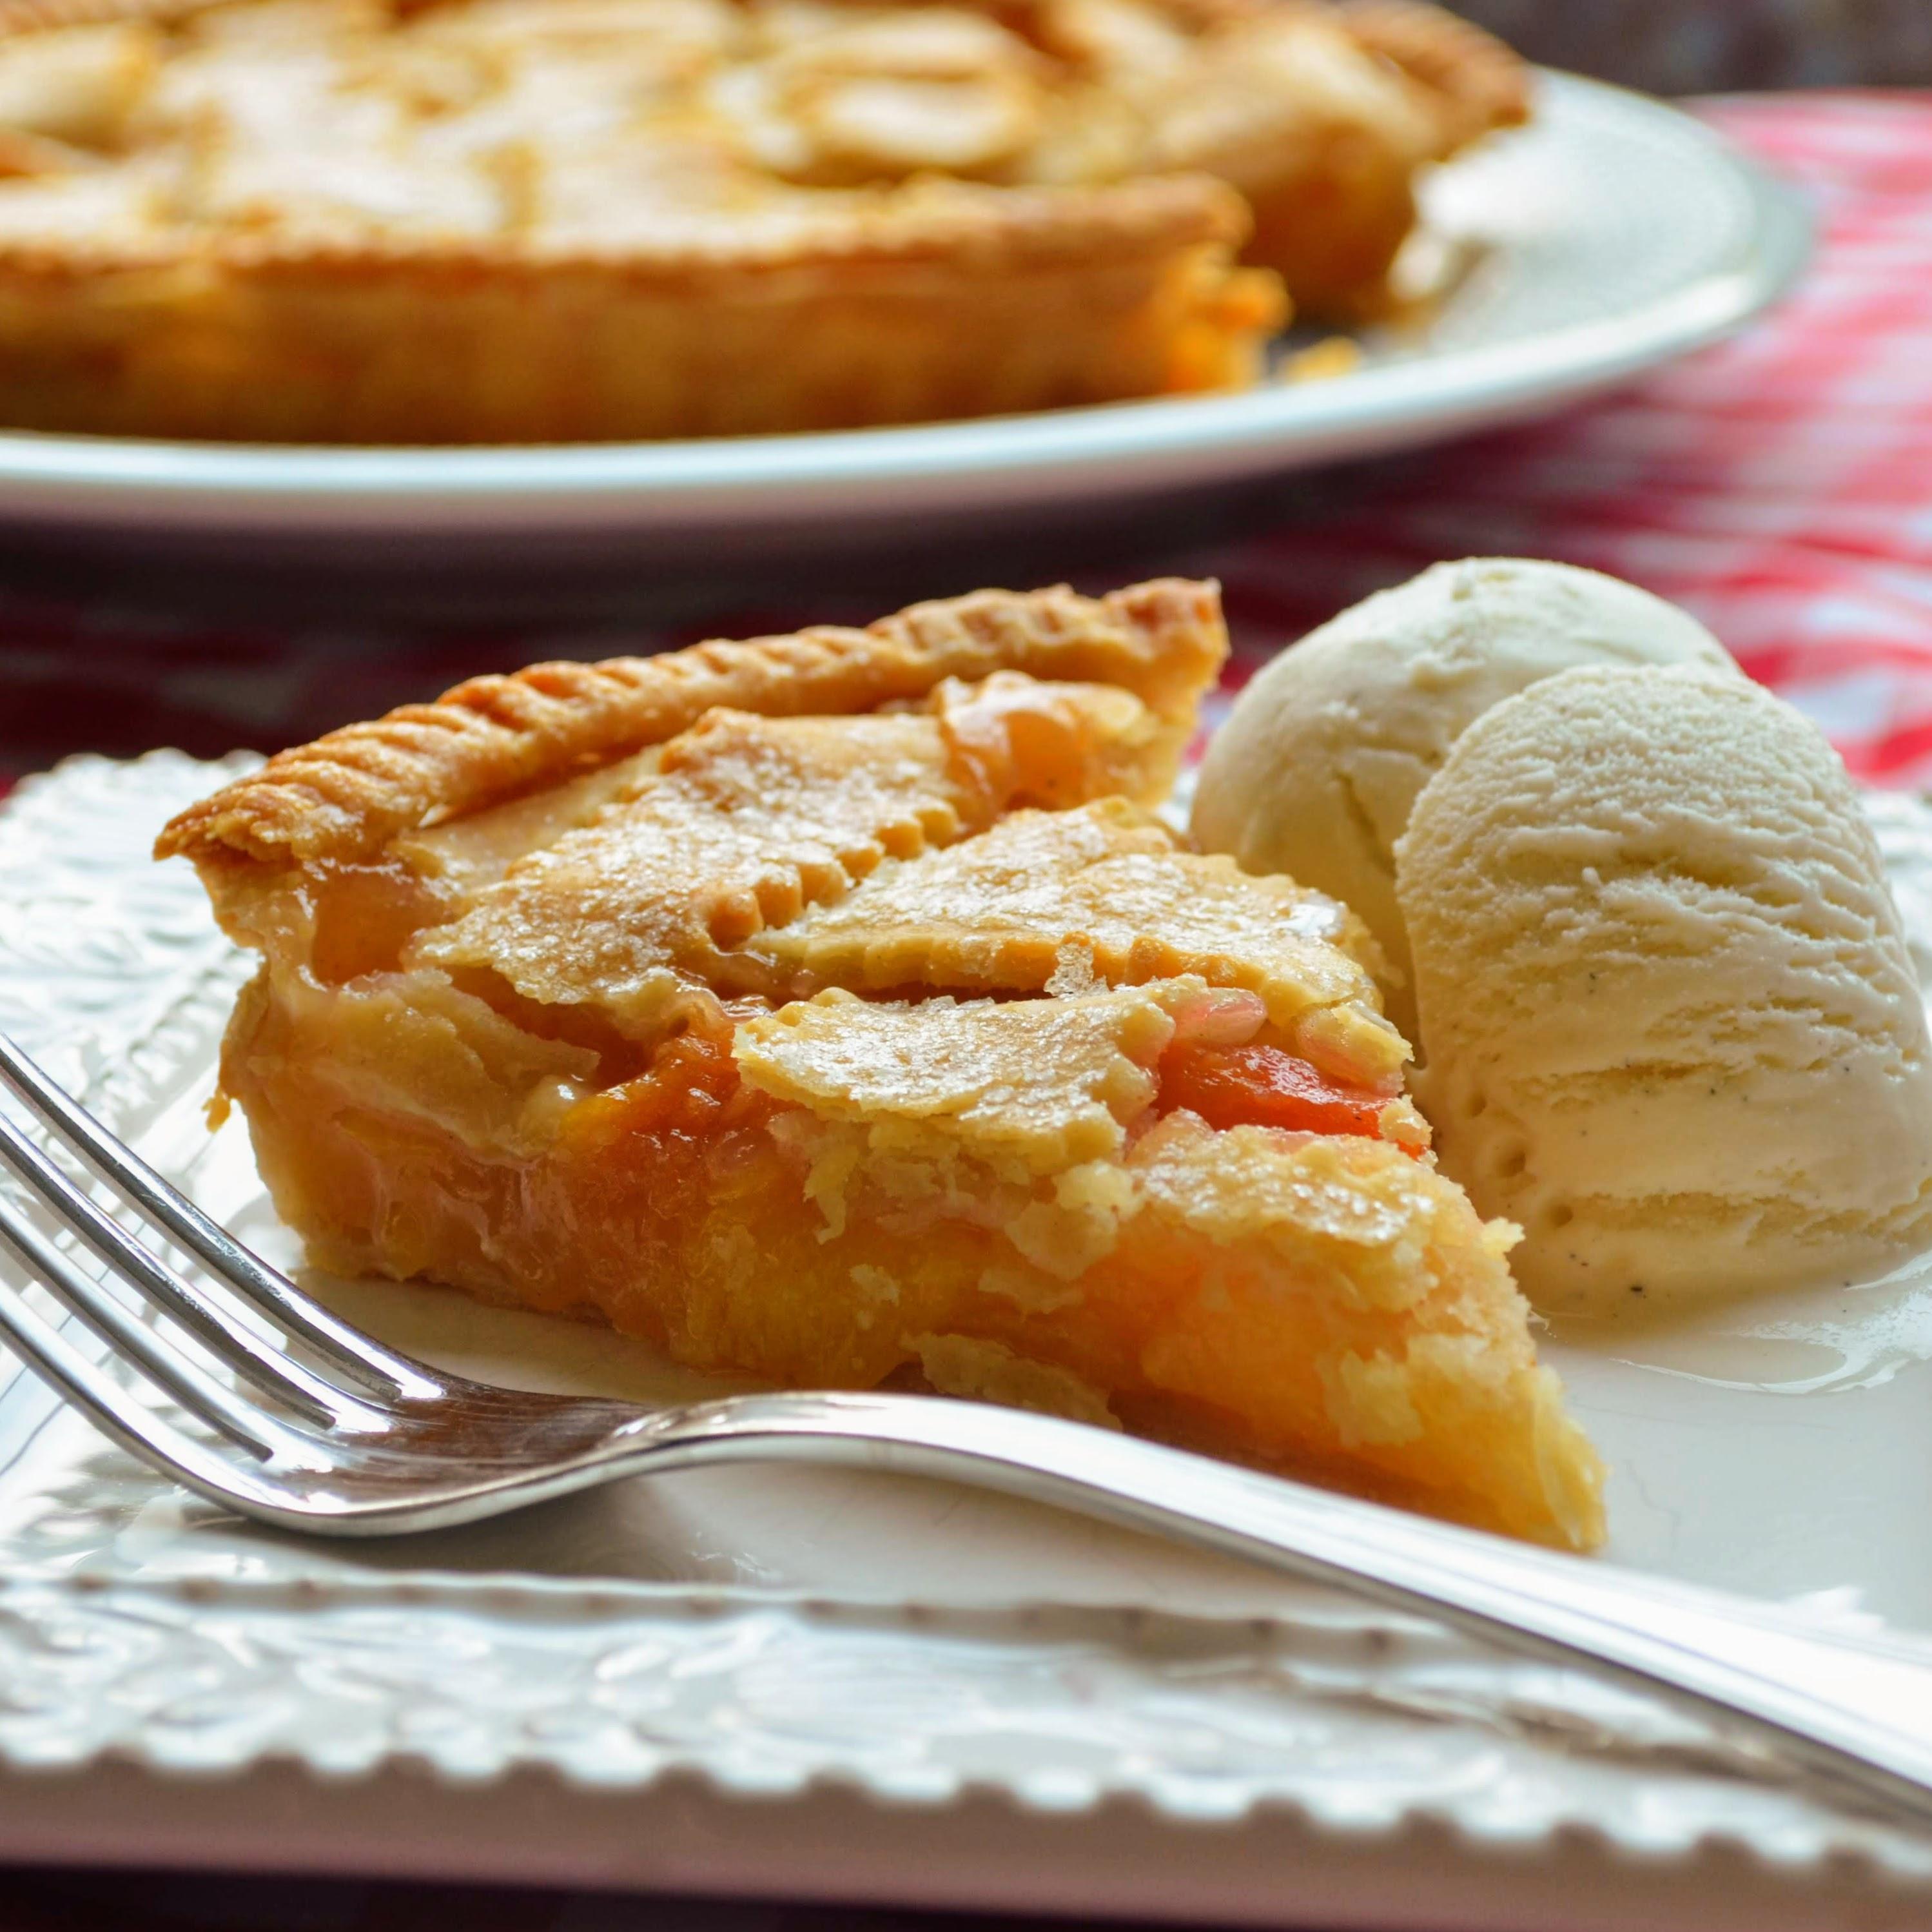 Chef John's Peach Pie